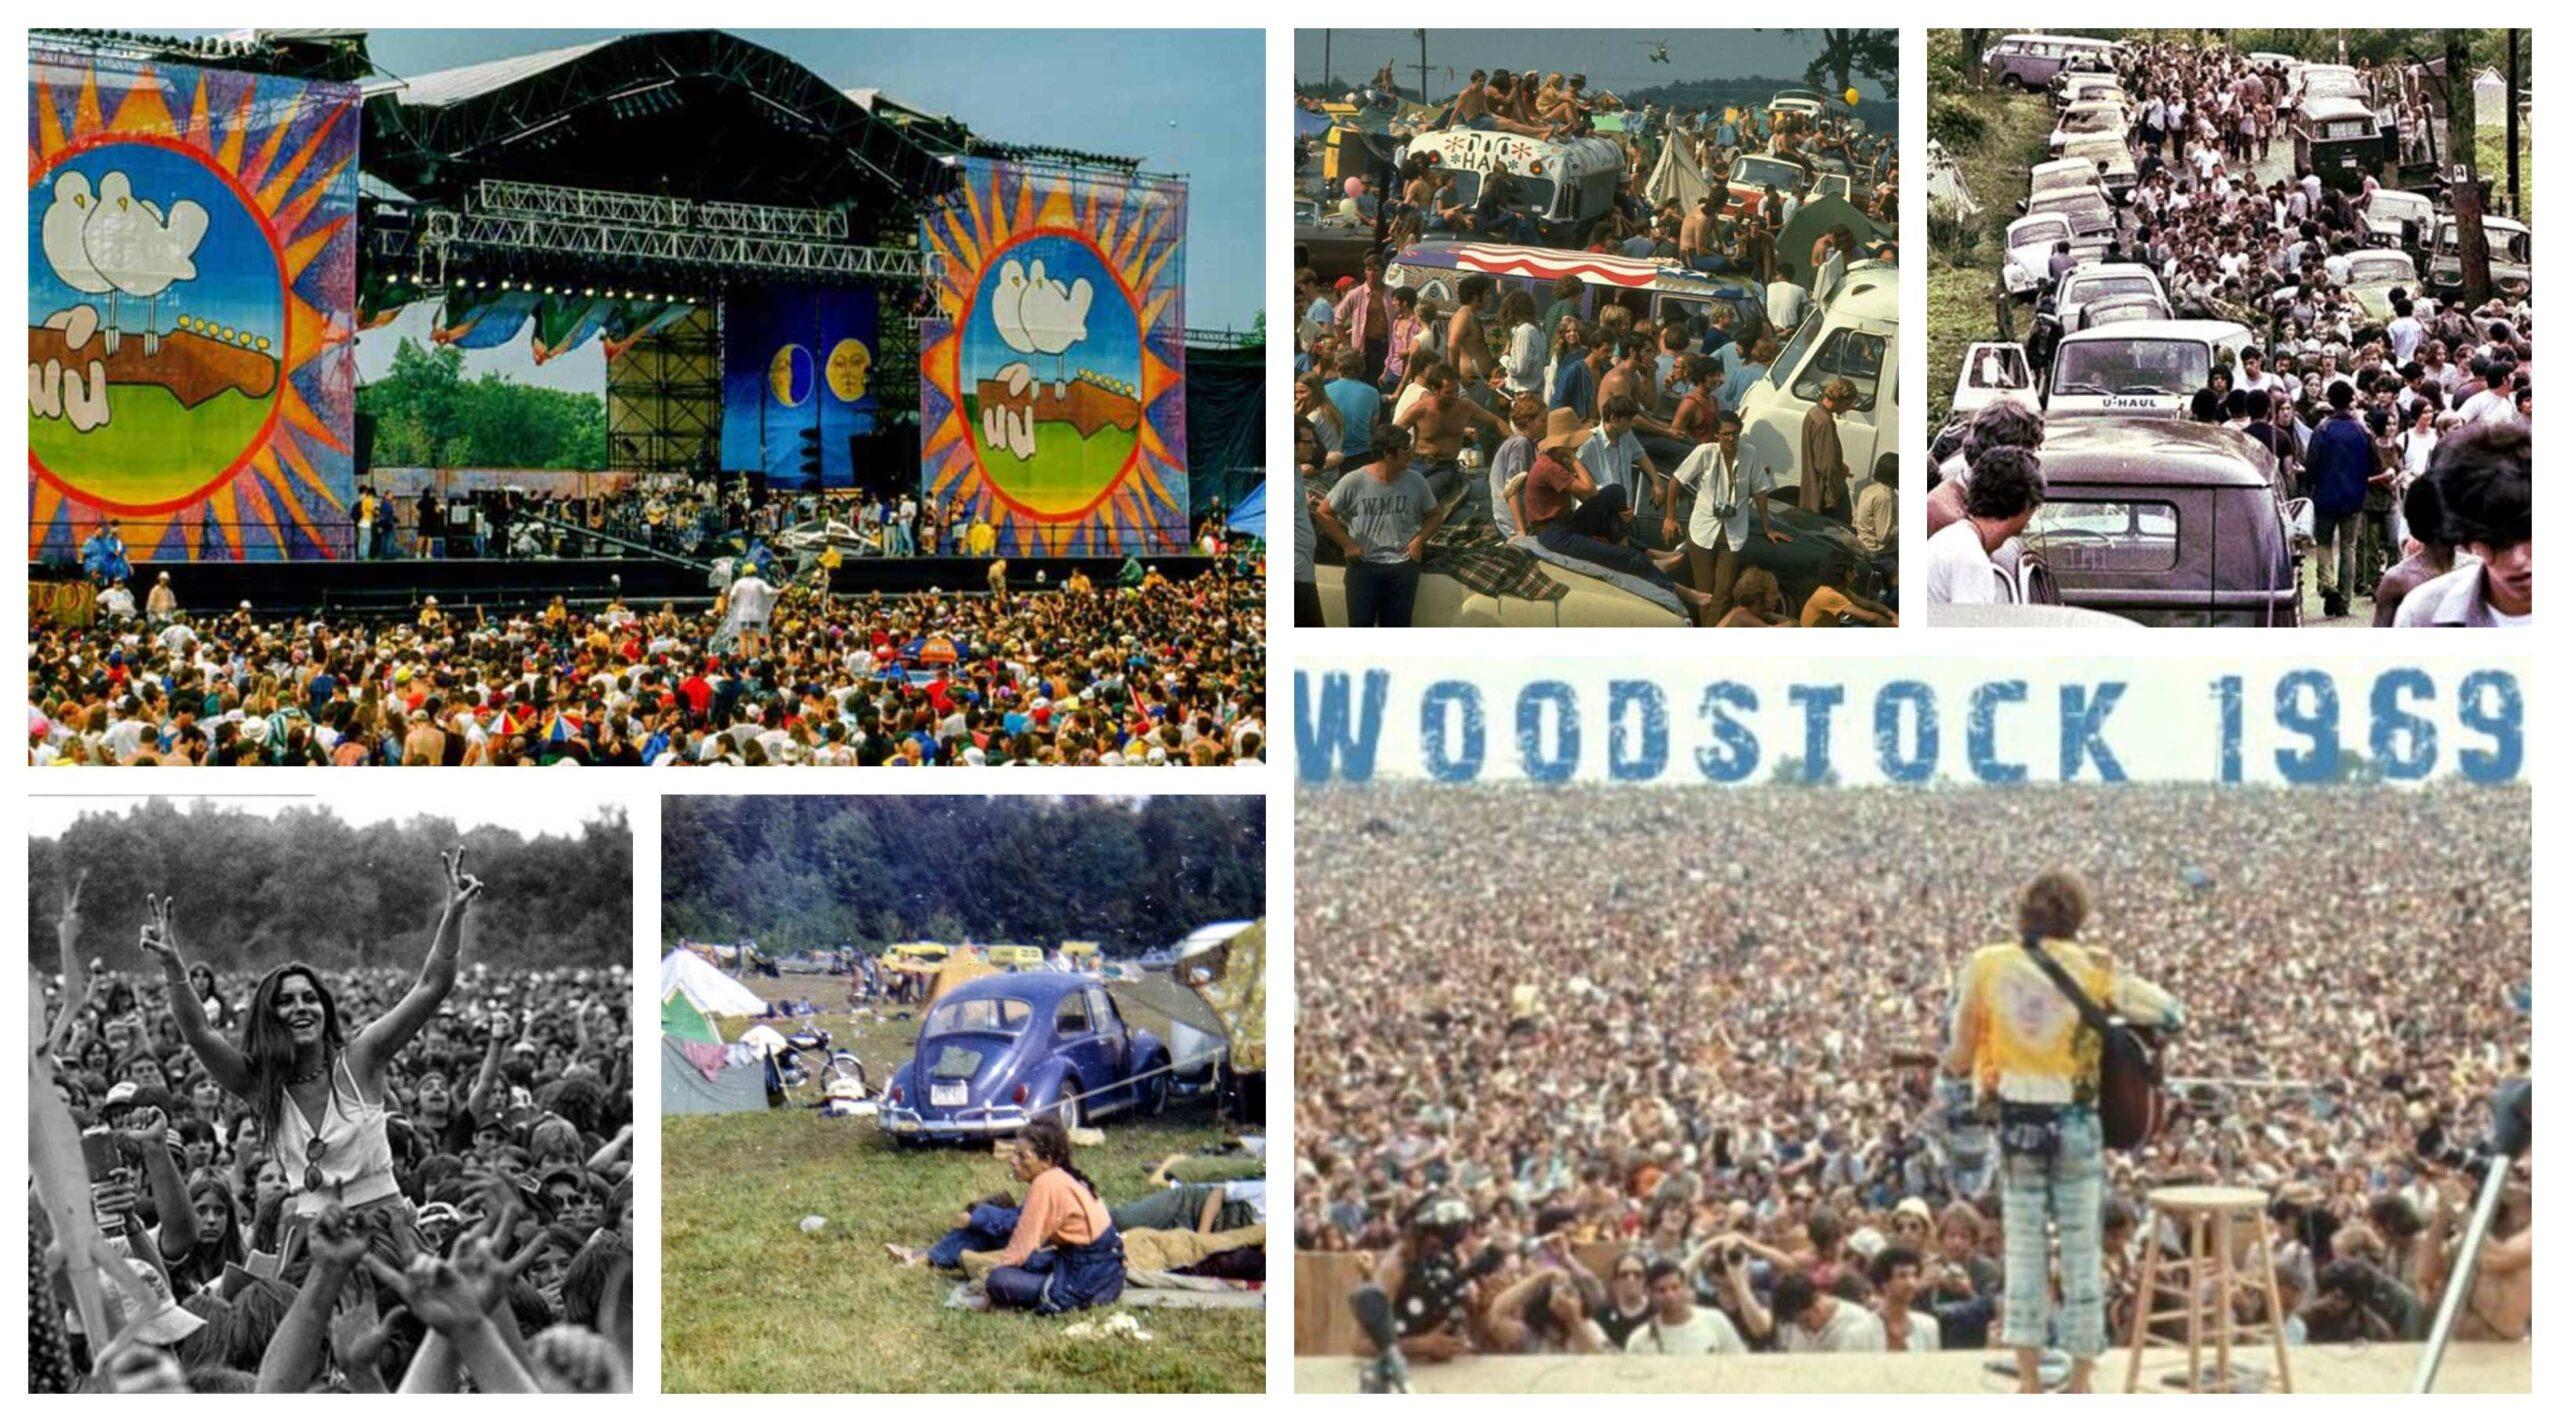 woodstock festival bandas anos 60